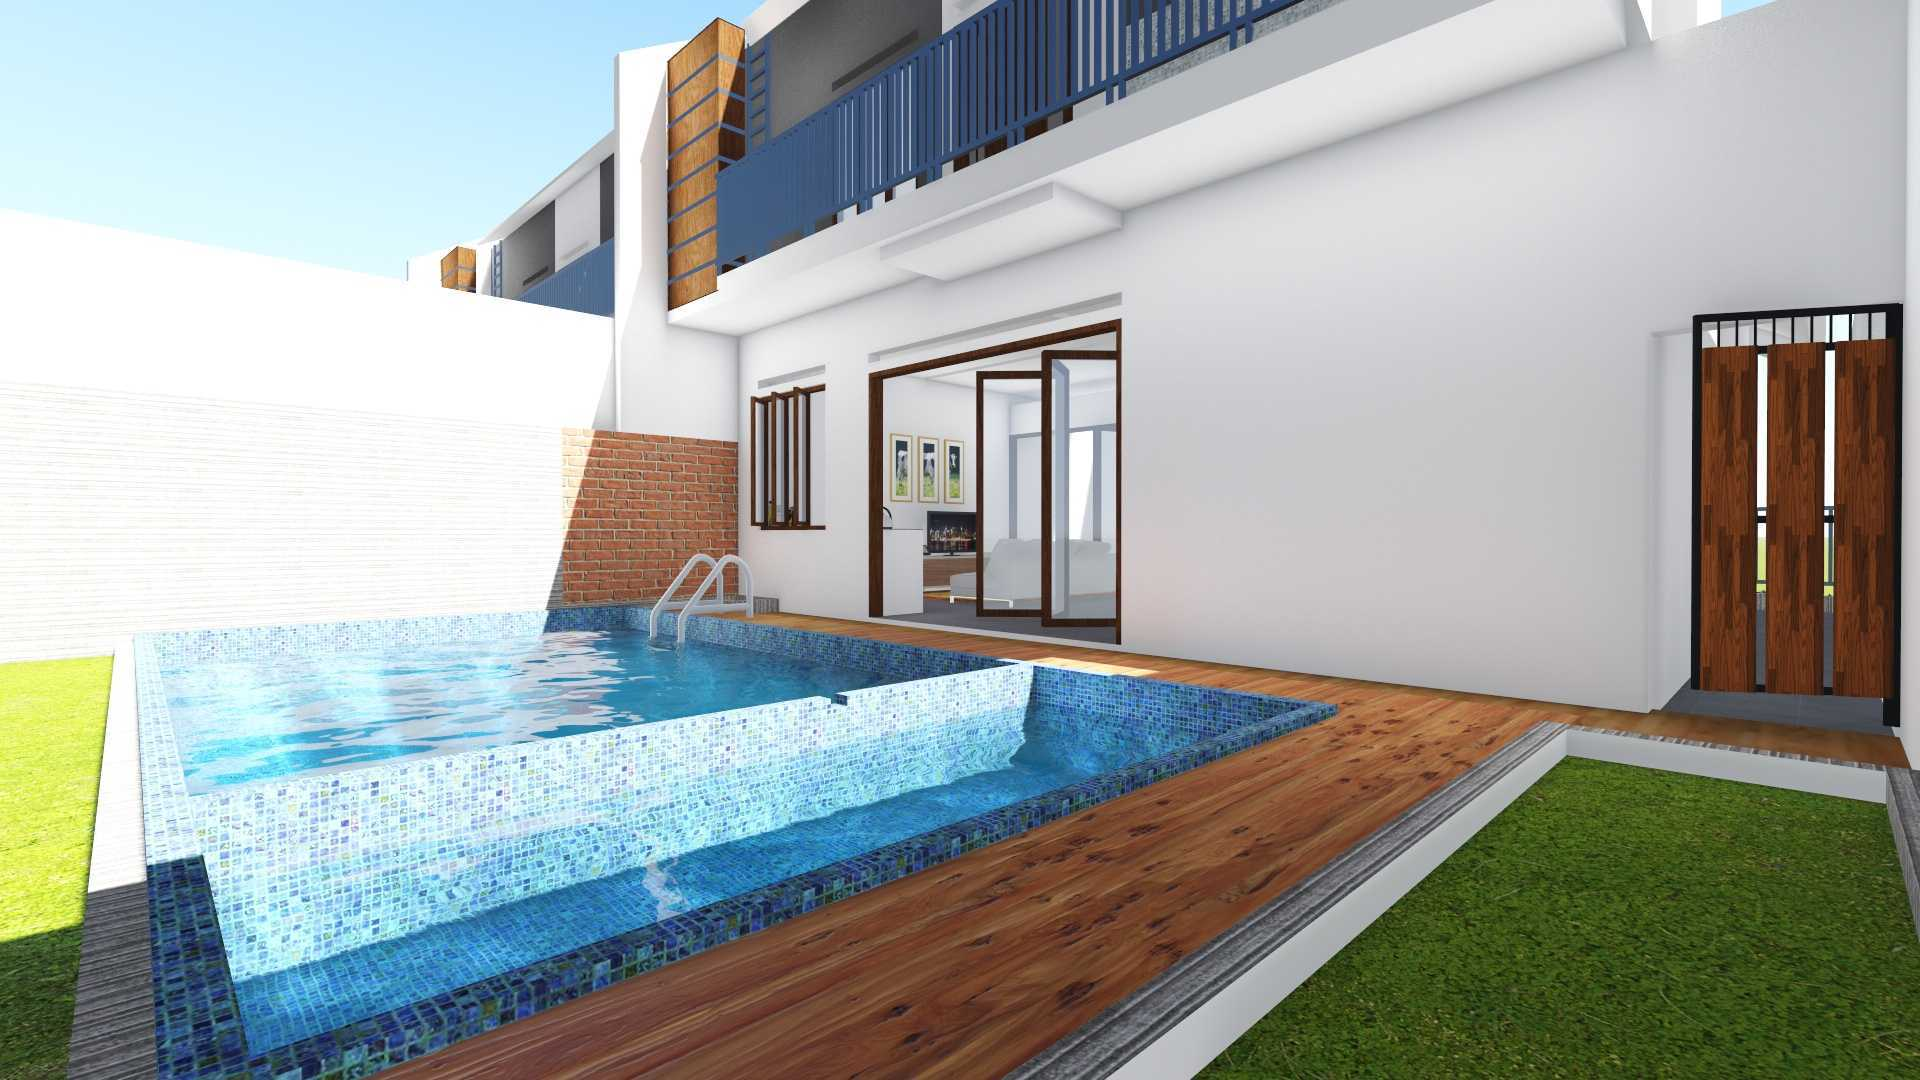 Havia Studio Rumah Sindanglaya Sindanglaya, Cimenyan, Bandung, Jawa Barat, Indonesia Sindanglaya, Cimenyan, Bandung, Jawa Barat, Indonesia Swimming Pool Area   46142